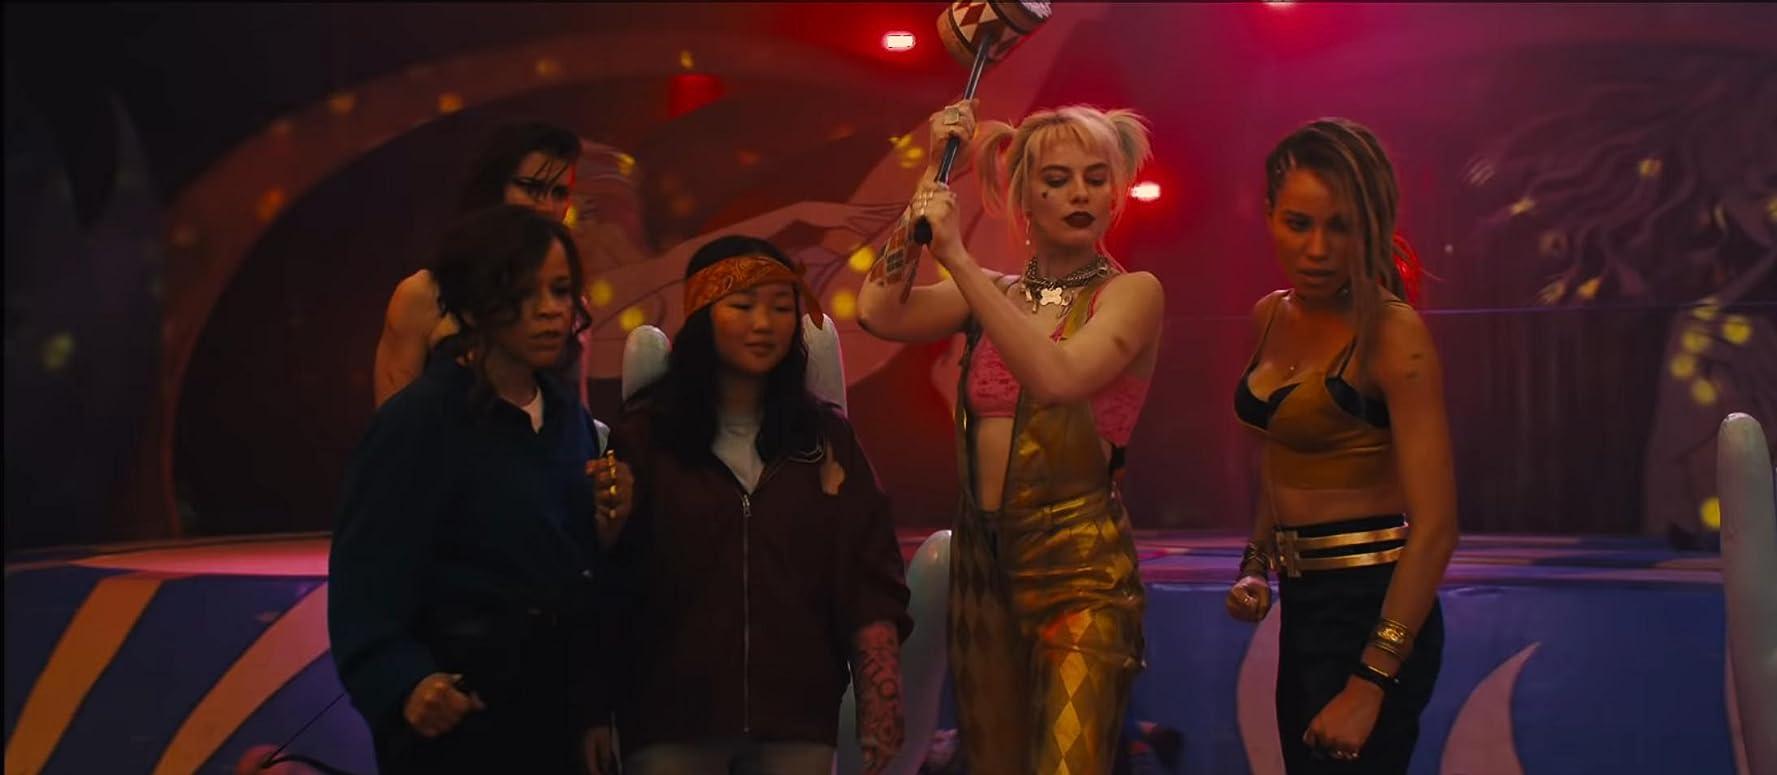 Rosie Perez, Jurnee Smollett-Bell, Mary Elizabeth Winstead, Margot Robbie, and Ali Wong in Birds of Prey: And the Fantabulous Emancipation of One Harley Quinn (2020)